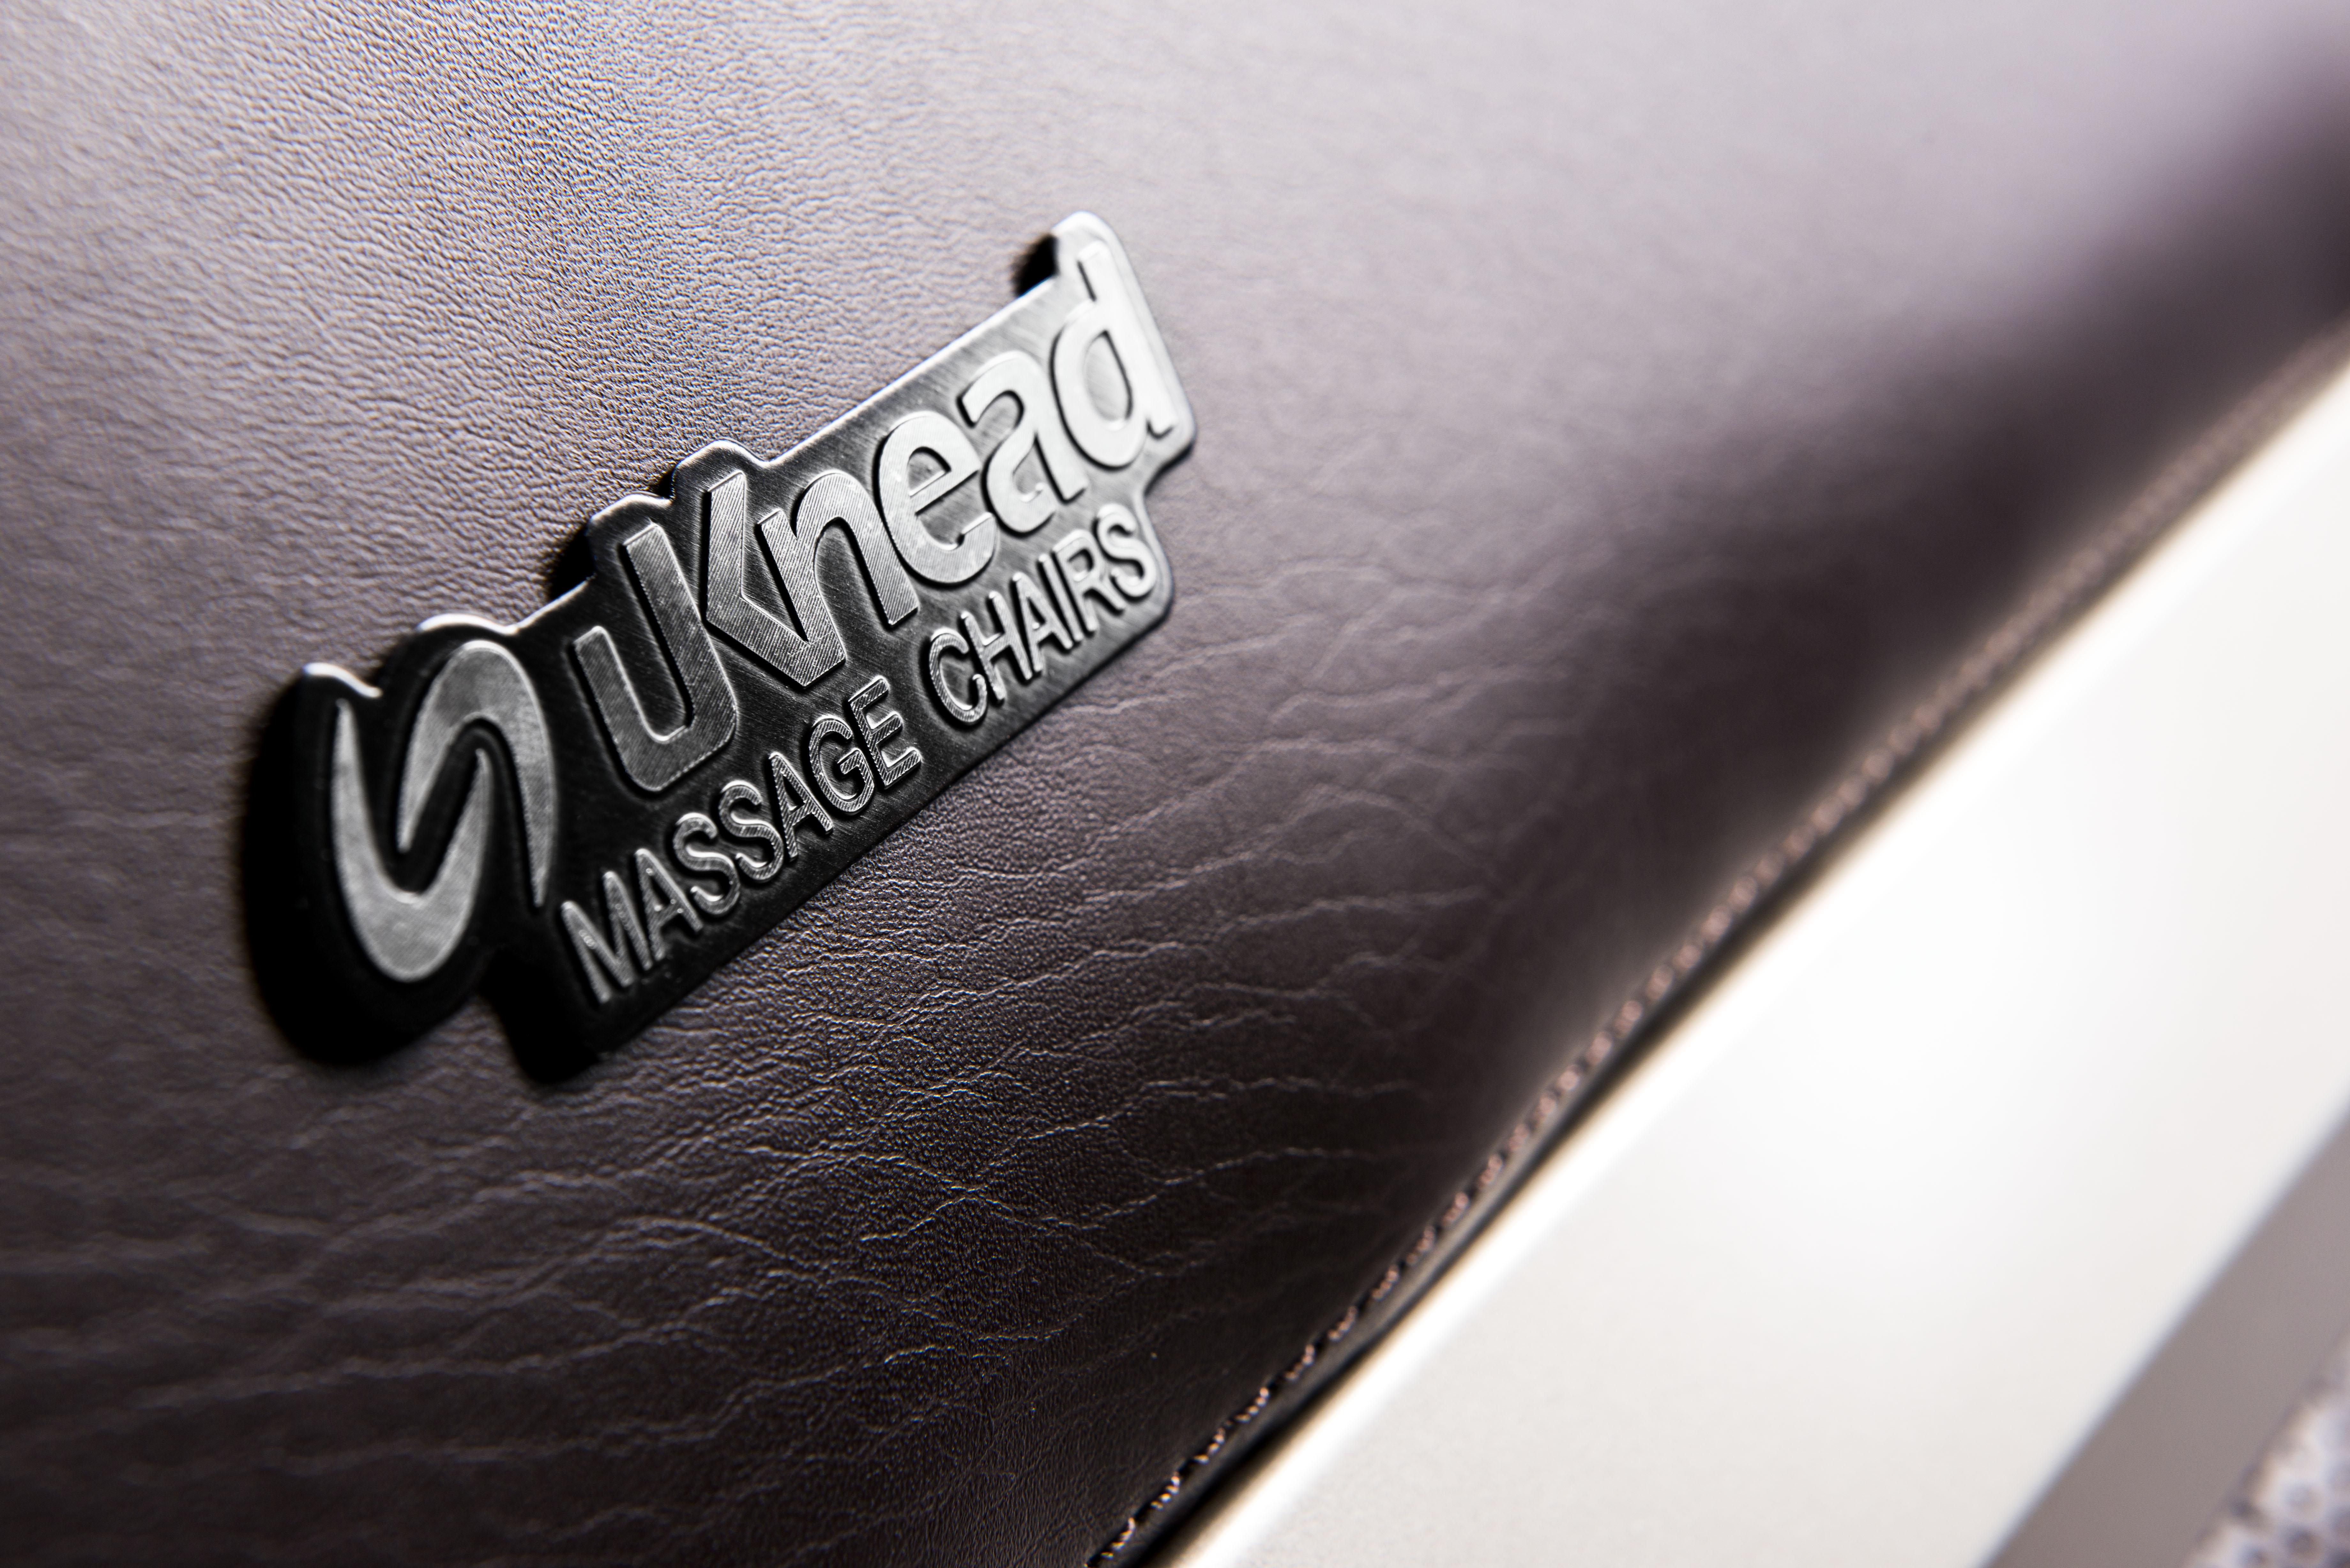 Uknead Massage Chair